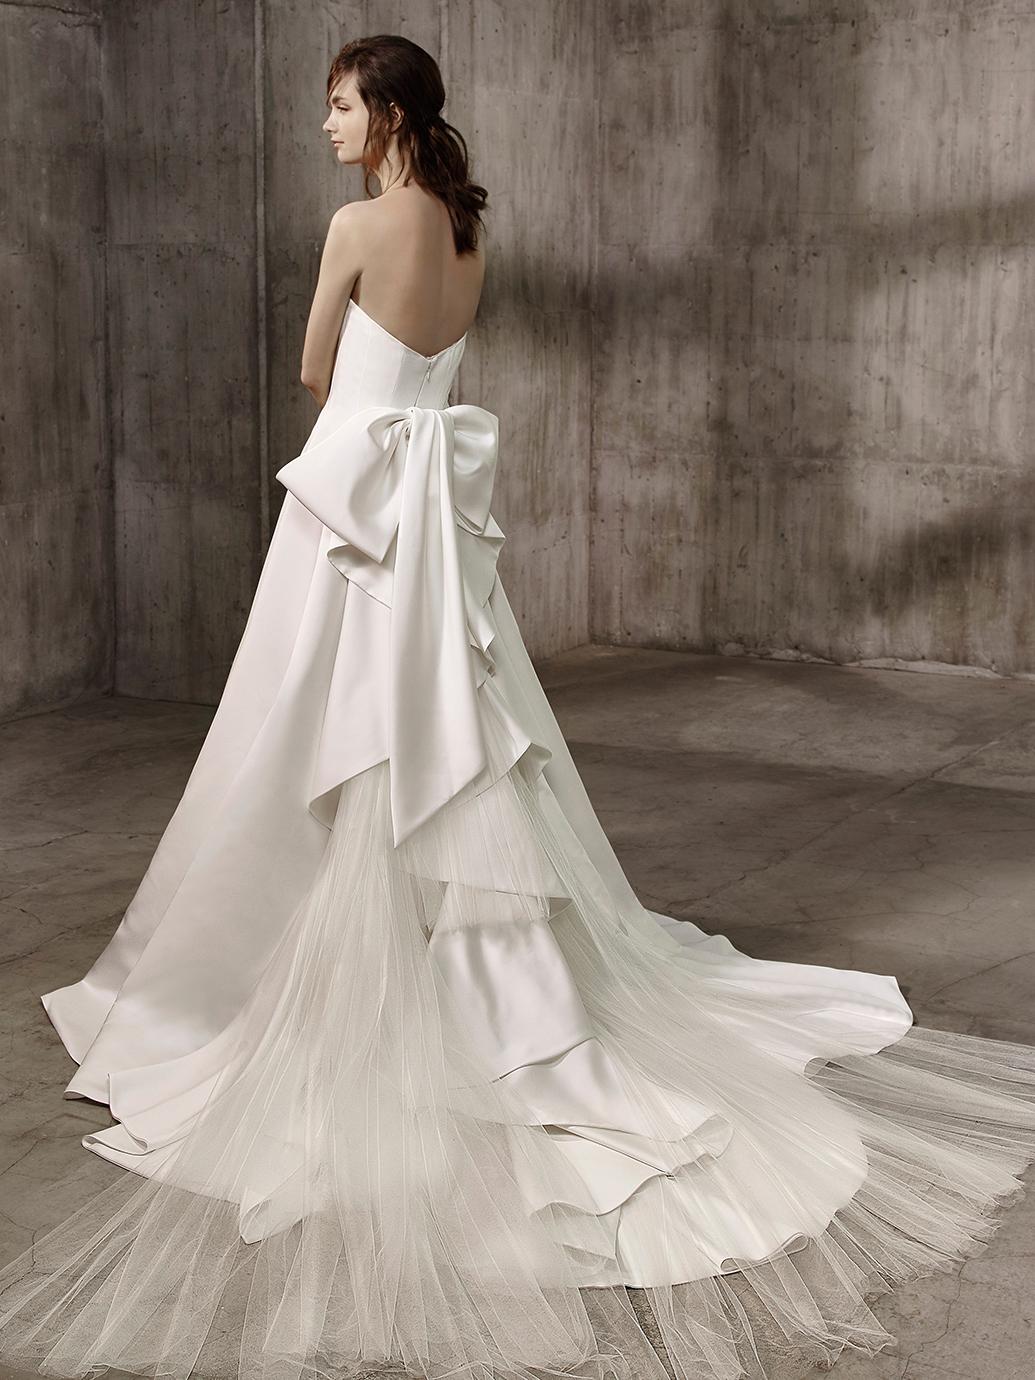 Badgley Mischka Wedding Dress Alice, satin wedding dress, Aline wedding dress, plain wedding dress, simple wedding dress, classic wedding dress